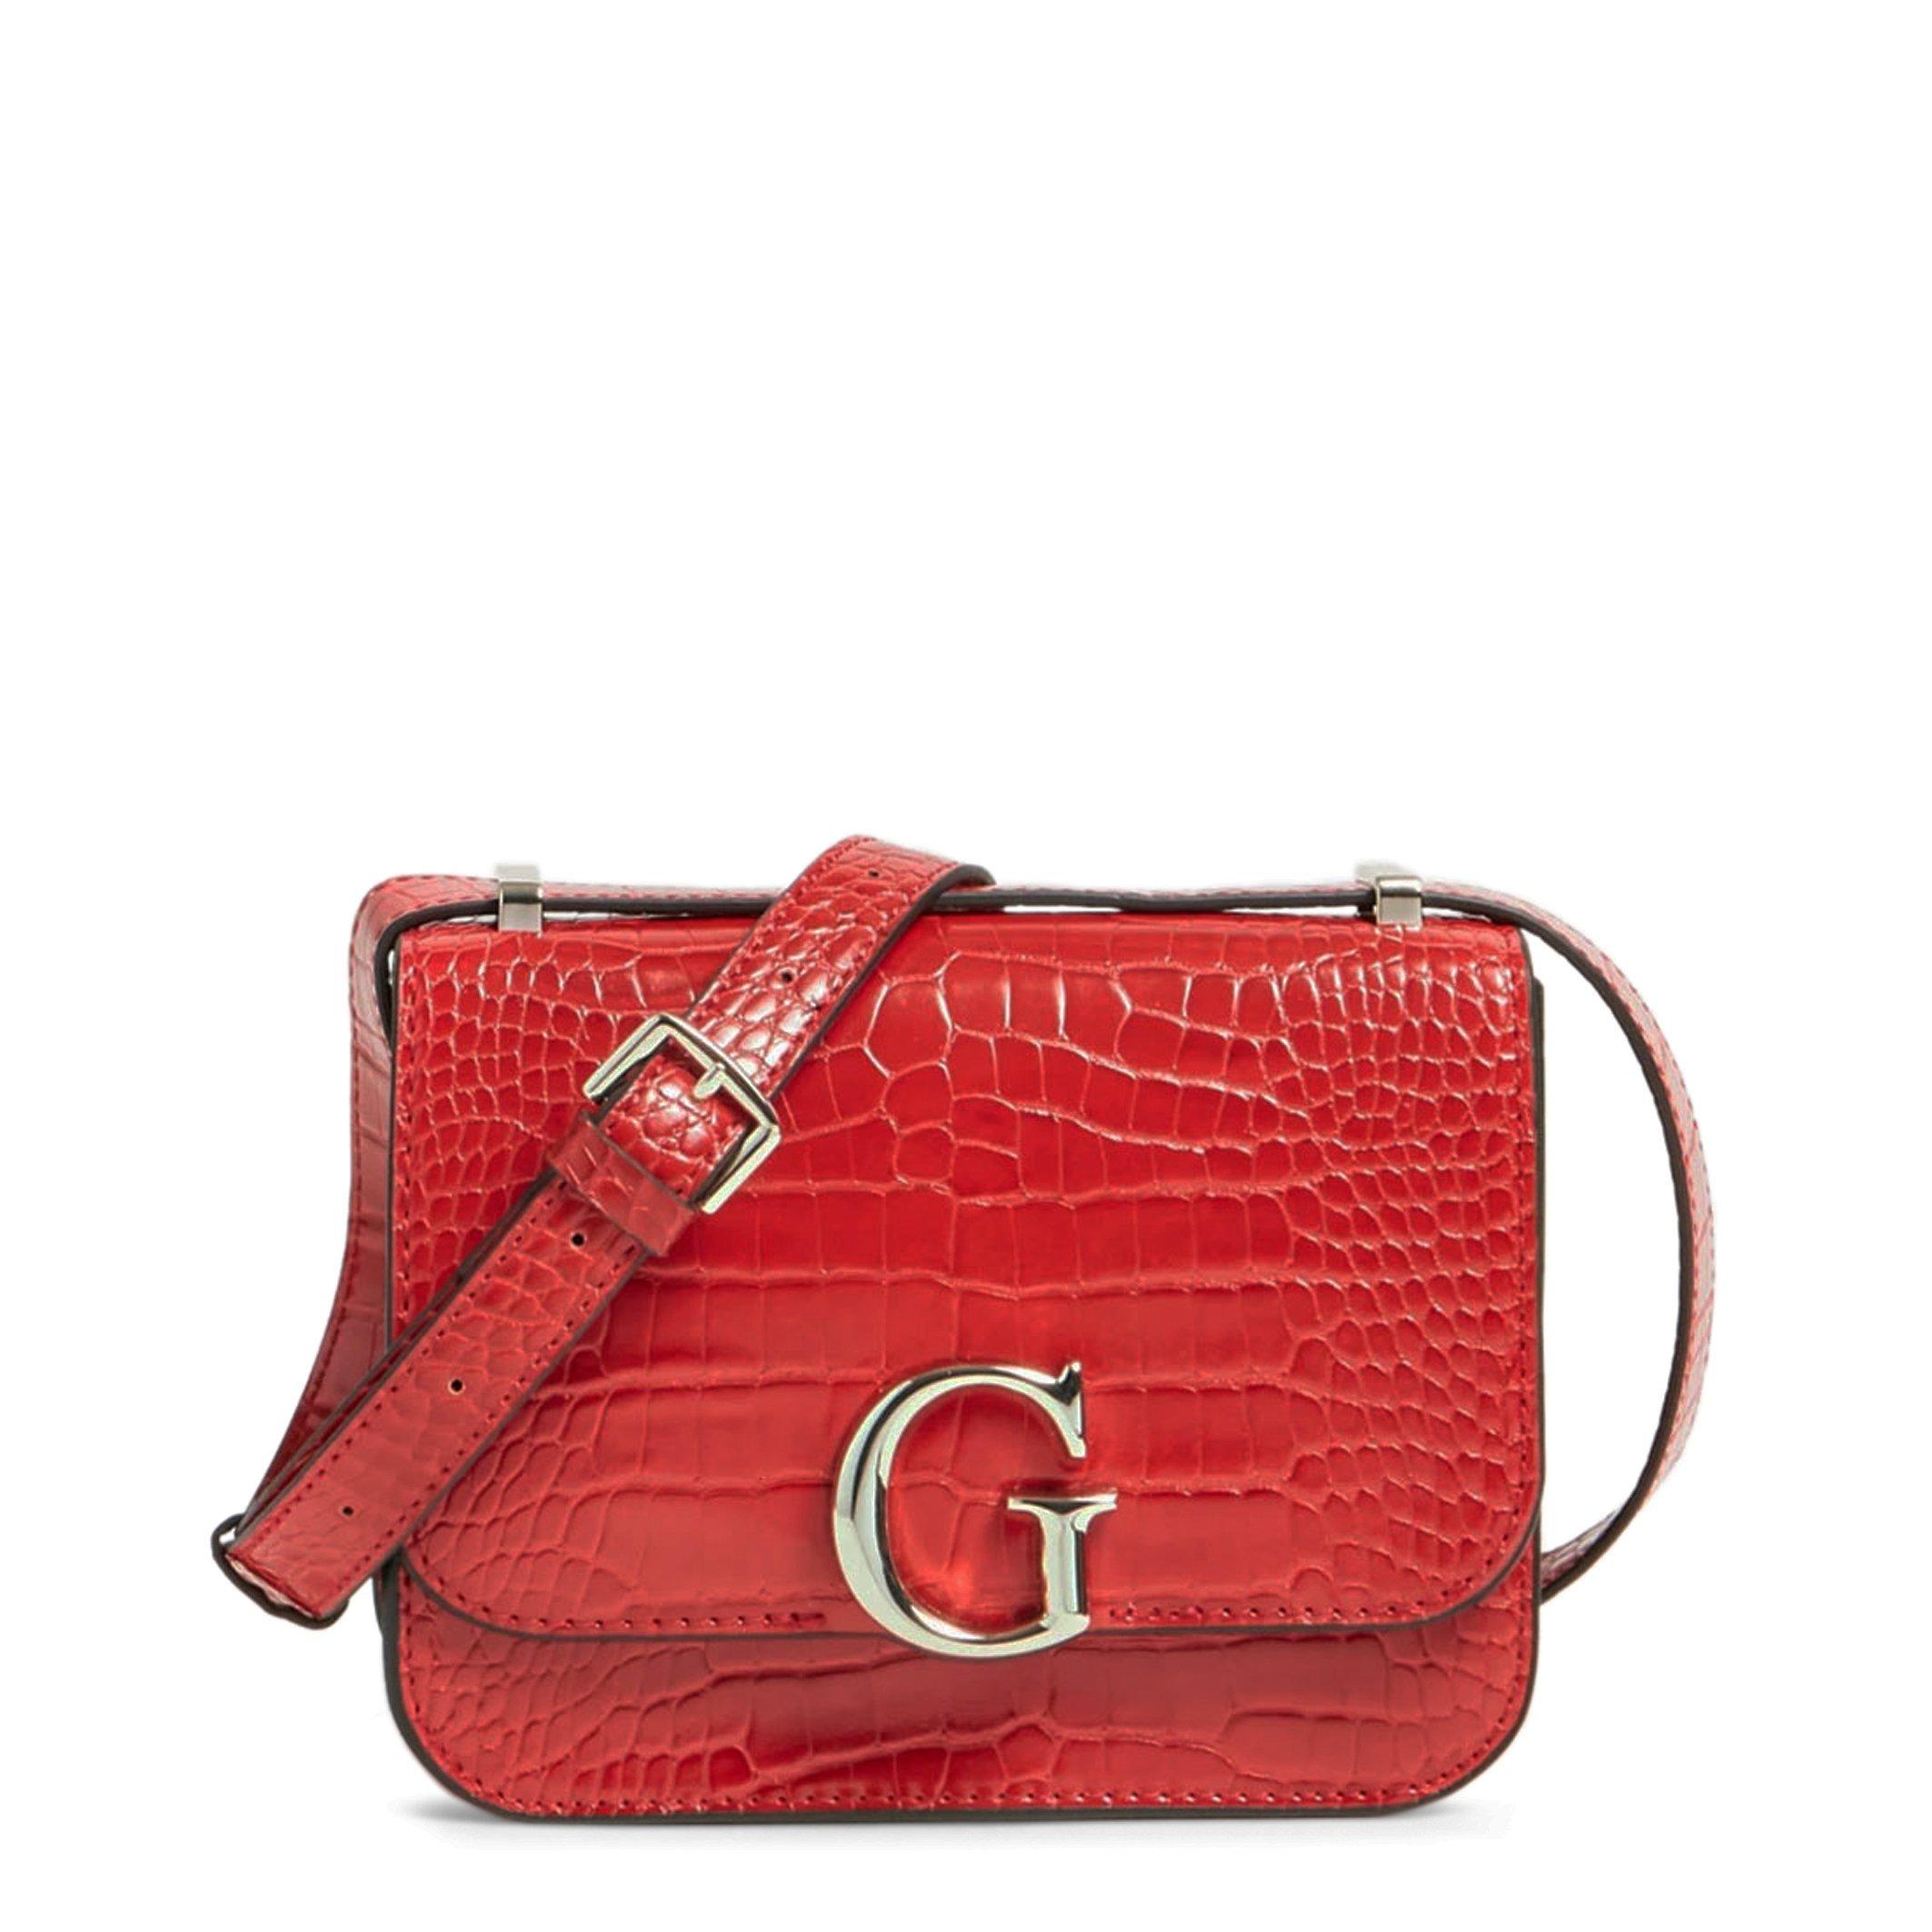 Guess Women's Crossbody Bag Various Colours Corily_HWCG79_91780 - red NOSIZE